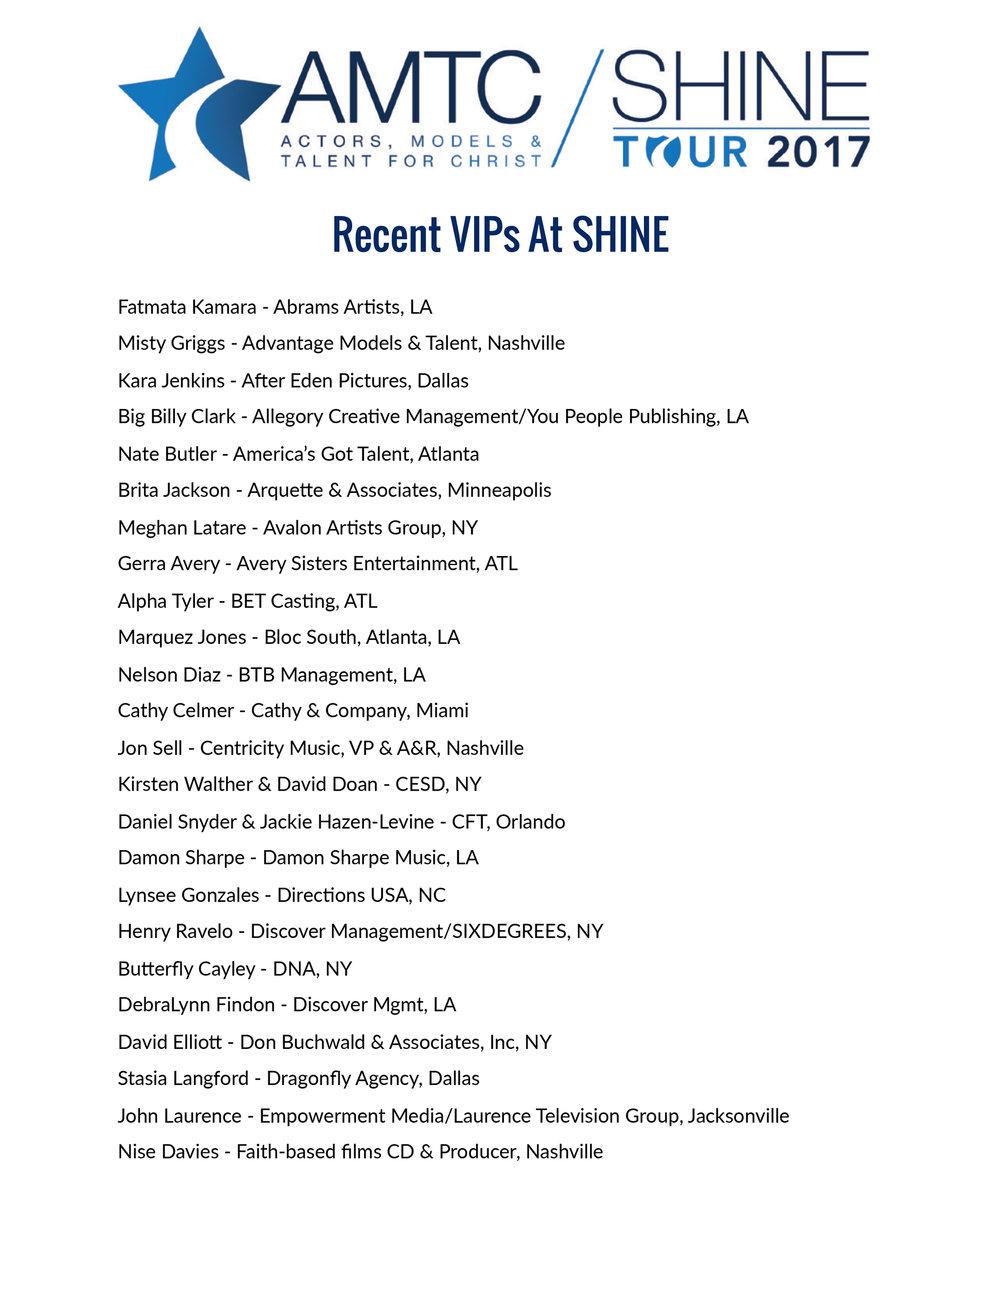 Download Sample VIP List